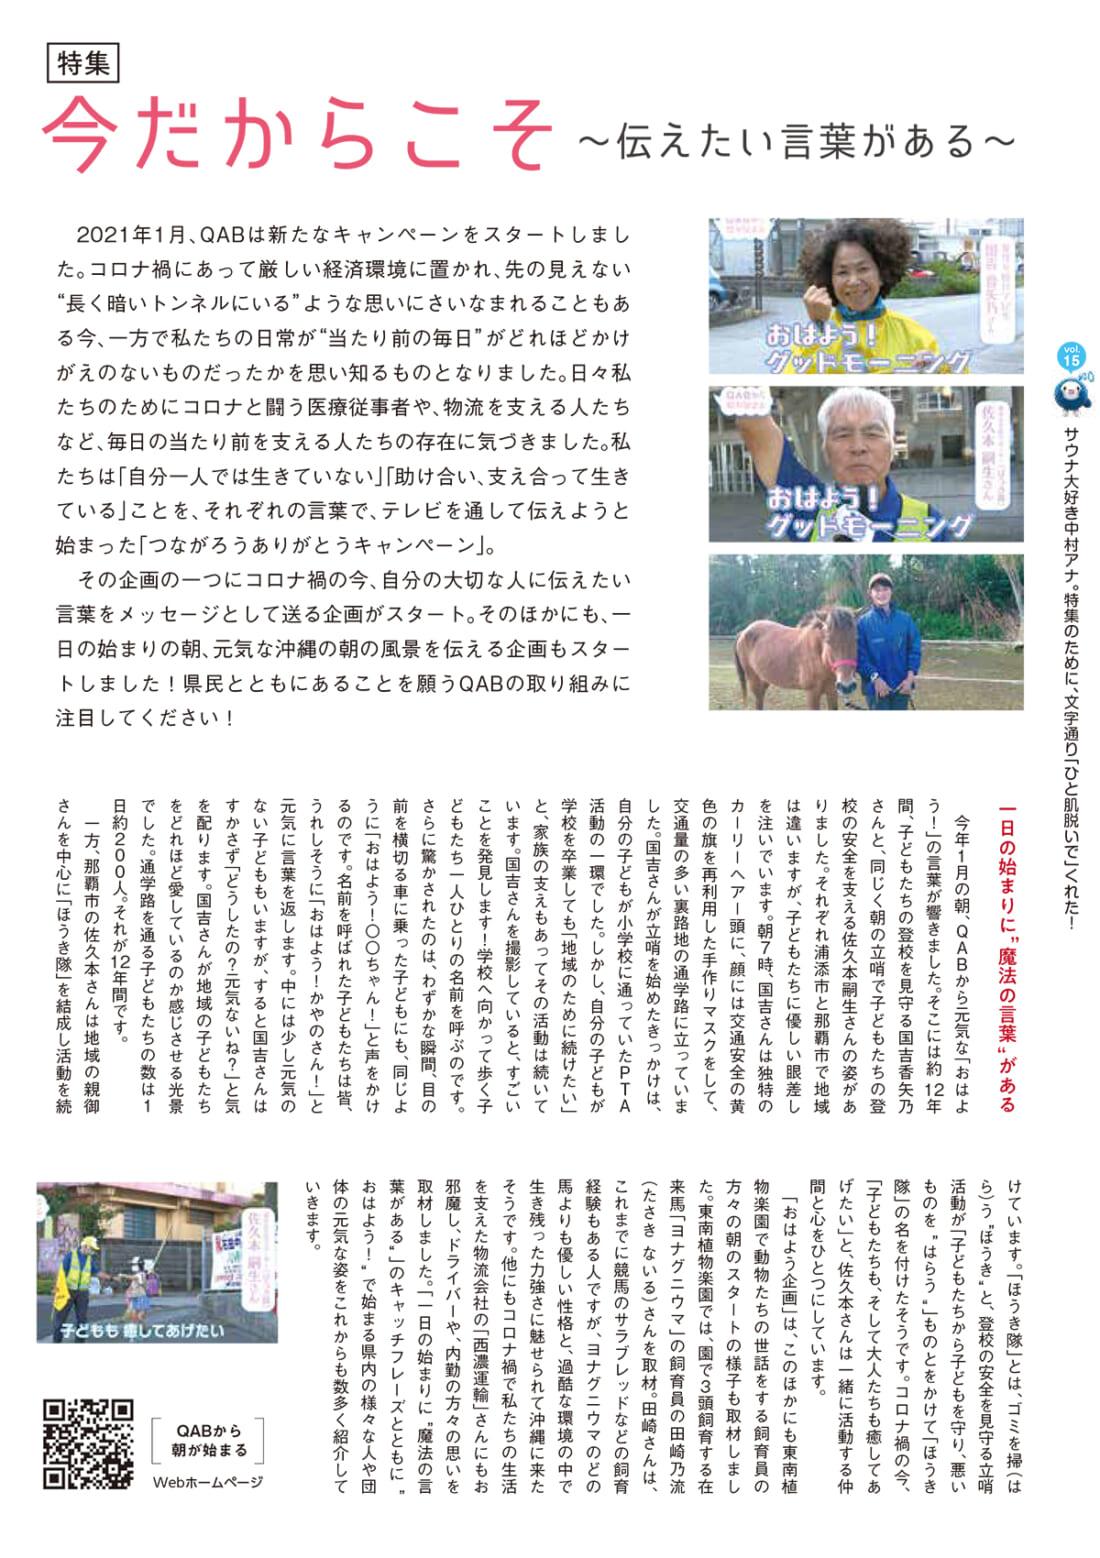 https://www.qab.co.jp/qgoro/wp-content/uploads/quun_1502-1100x1558.jpg